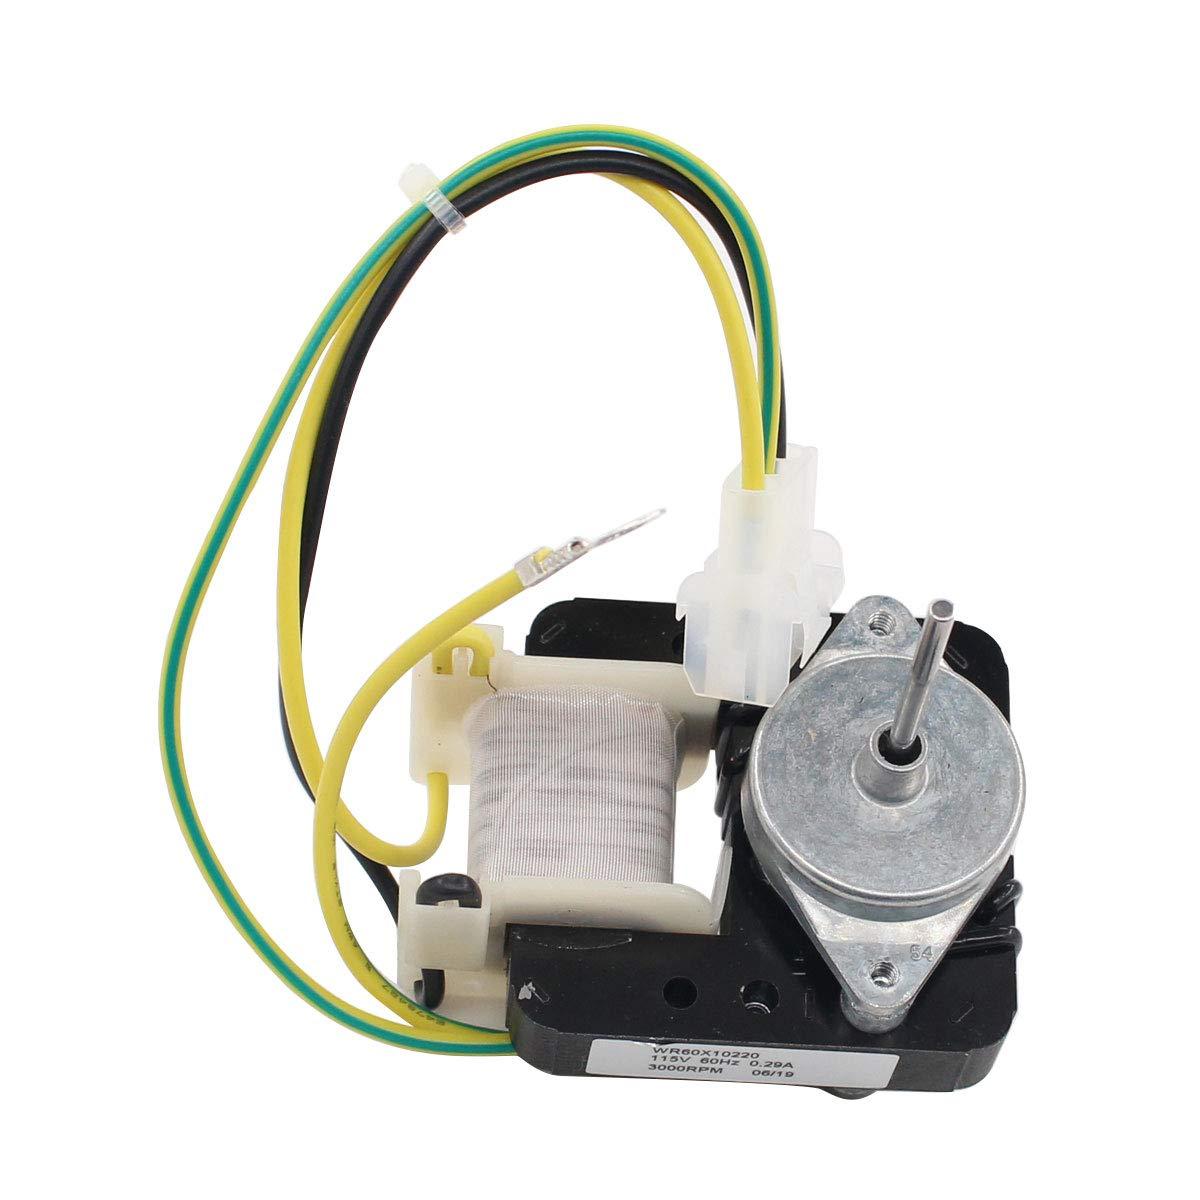 ApplianPar WR60X10220 Refrigerator Condenser Compressor Fan Motor for General Electric GE Repalce 1257132, AP4298602, PS1766247, WR60X10133, WR60X10171